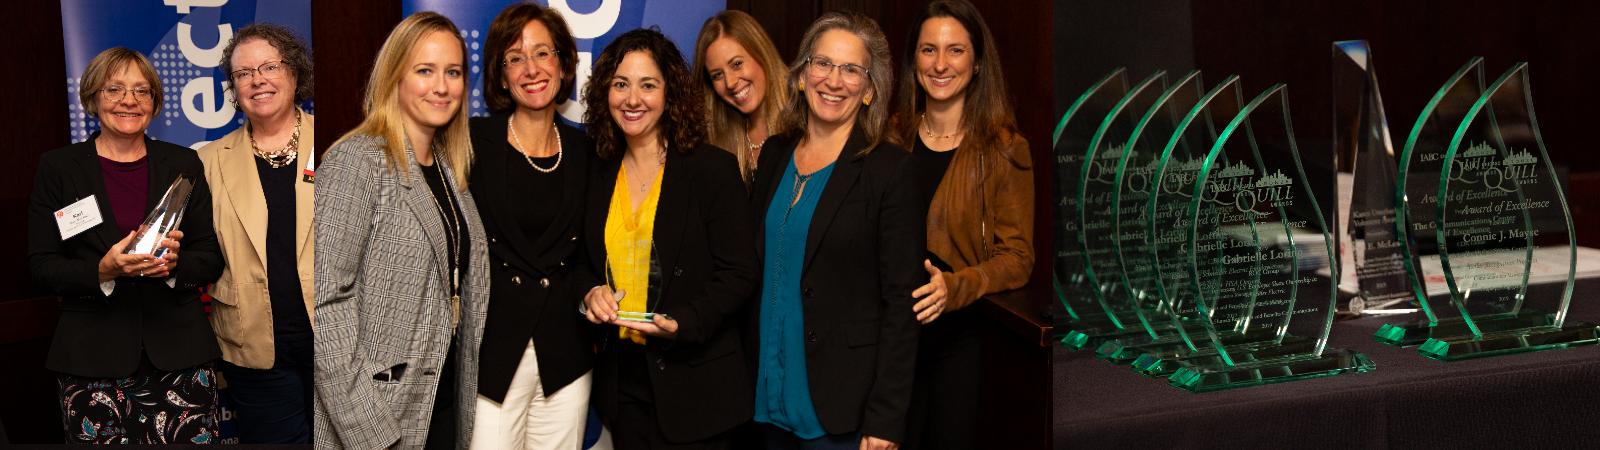 Congrats to Our 2019 Bronze Quill Award Winners & Karen Utterback Honoree